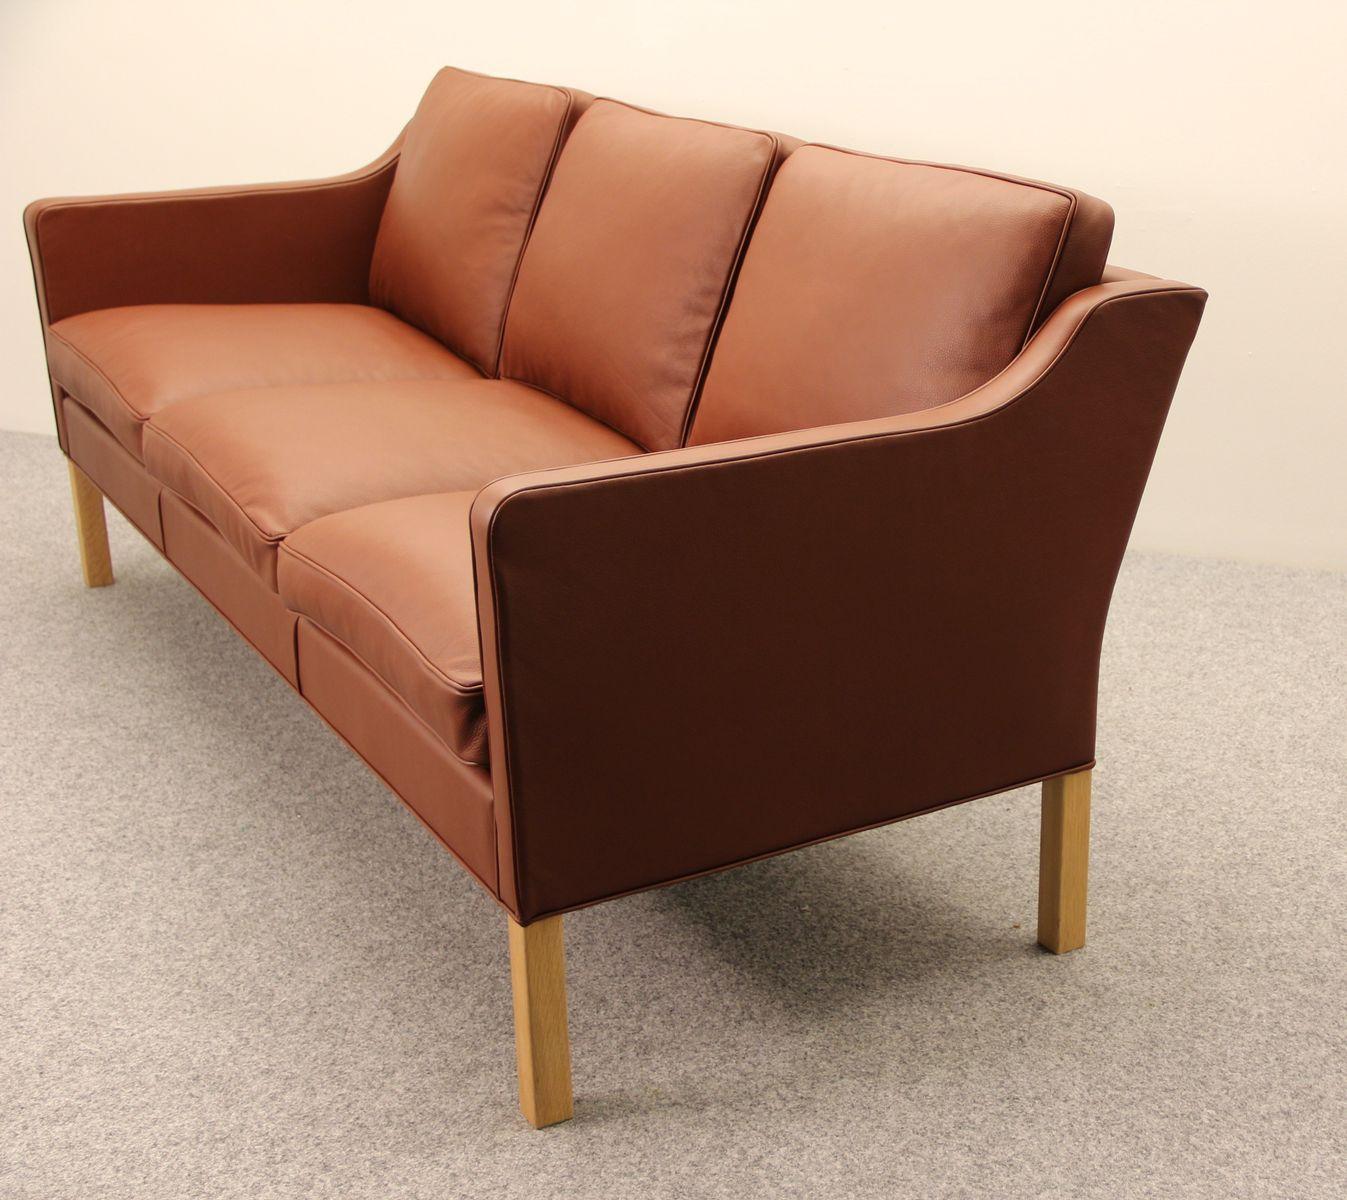 danish model 2323 sofa by b rge mogensen for fredericia. Black Bedroom Furniture Sets. Home Design Ideas